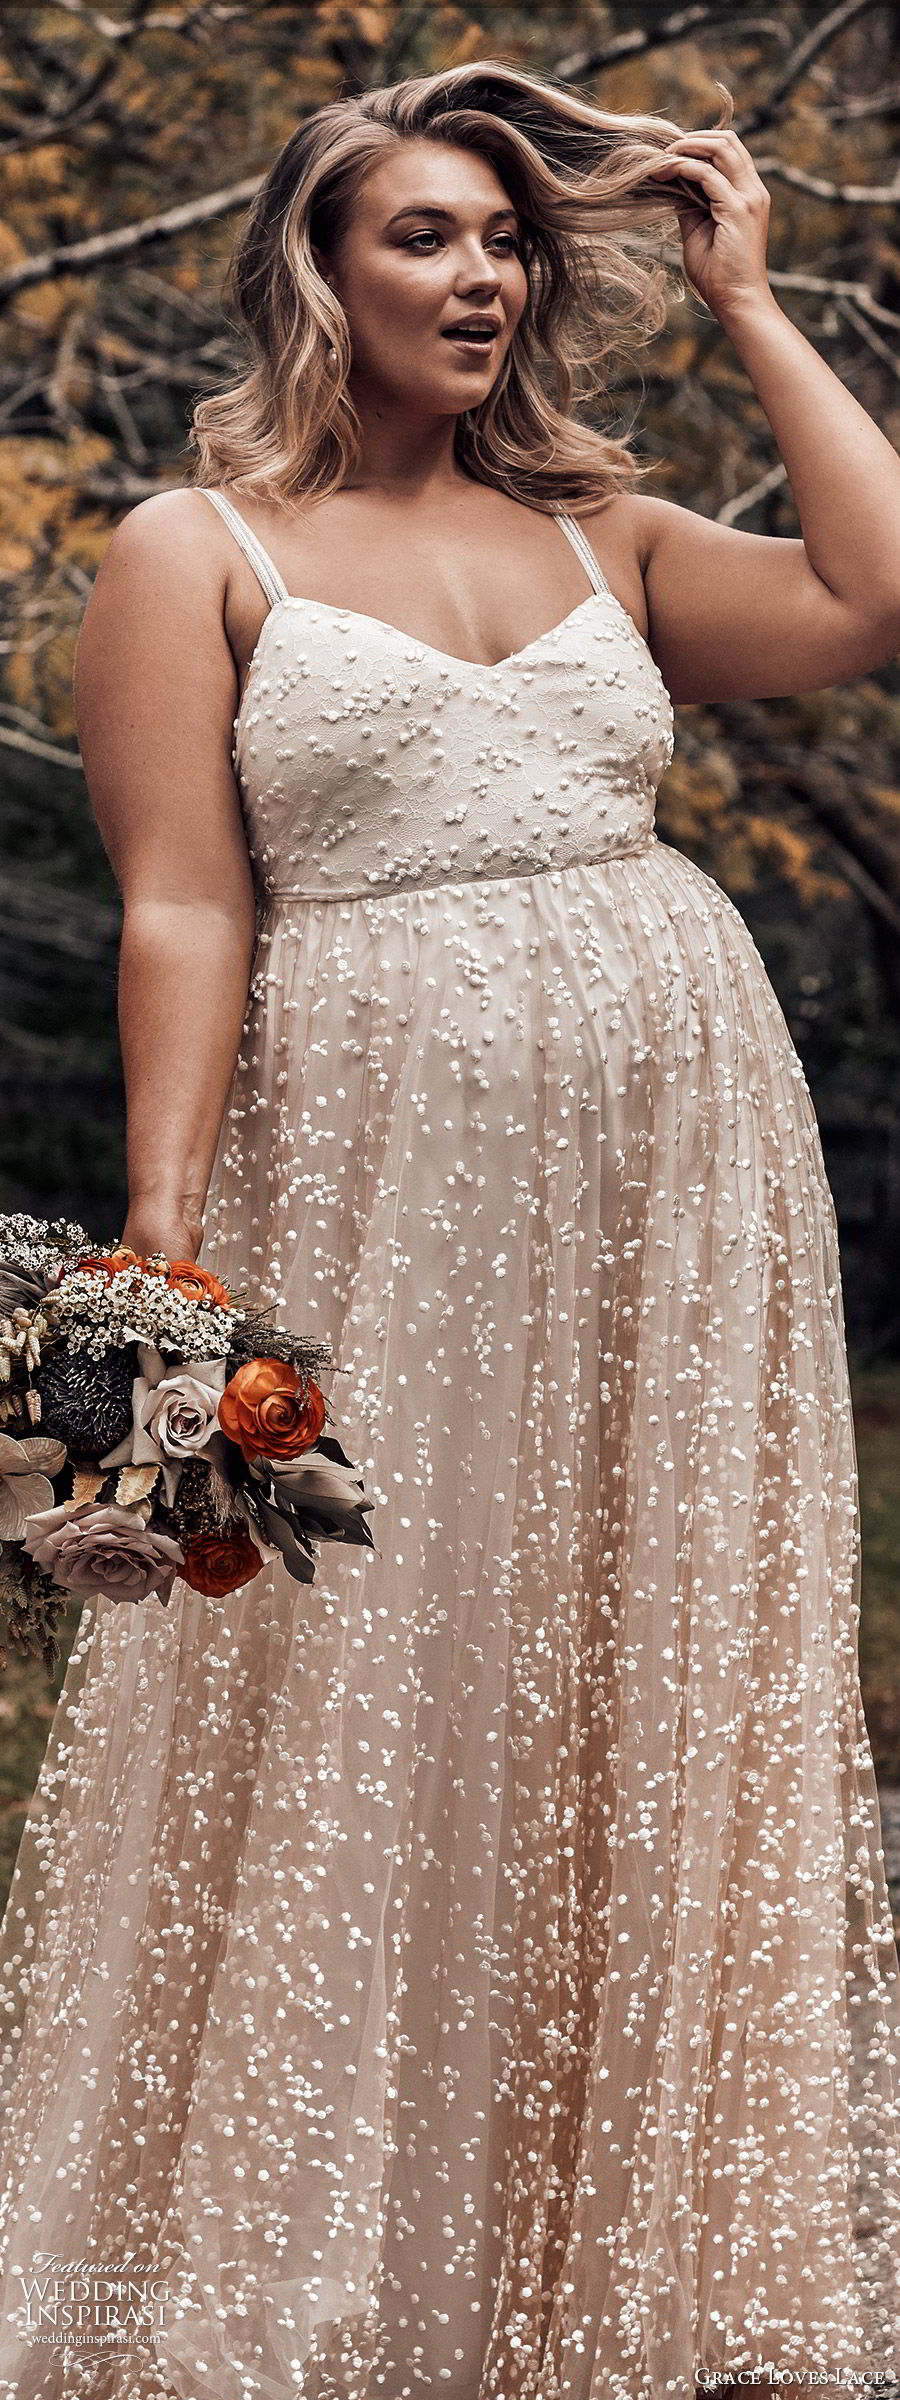 grace loves lace 2019 bridal sleeveless straps sweetheart neckline fully embellished a line ball gown wedding dress romantic elegant plus size blush (5) lv